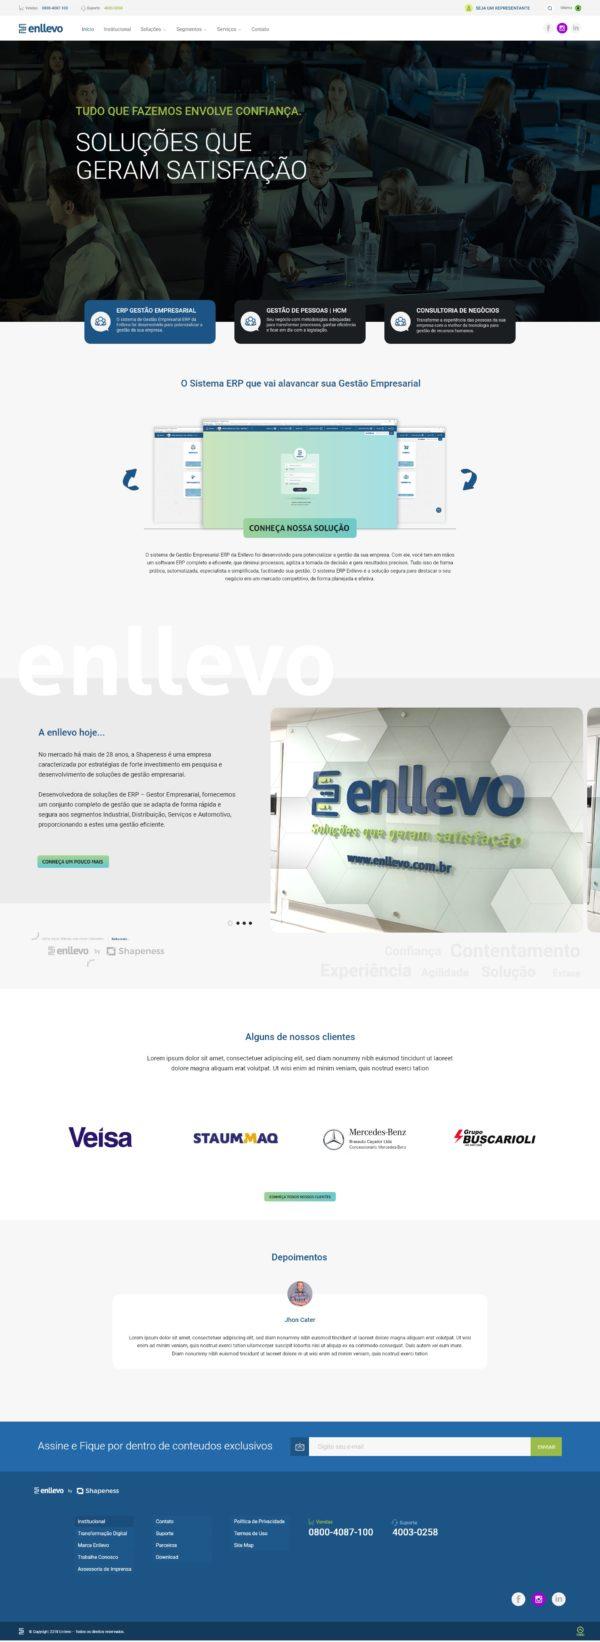 enllevo-website-http://www.enllevo.com.br/